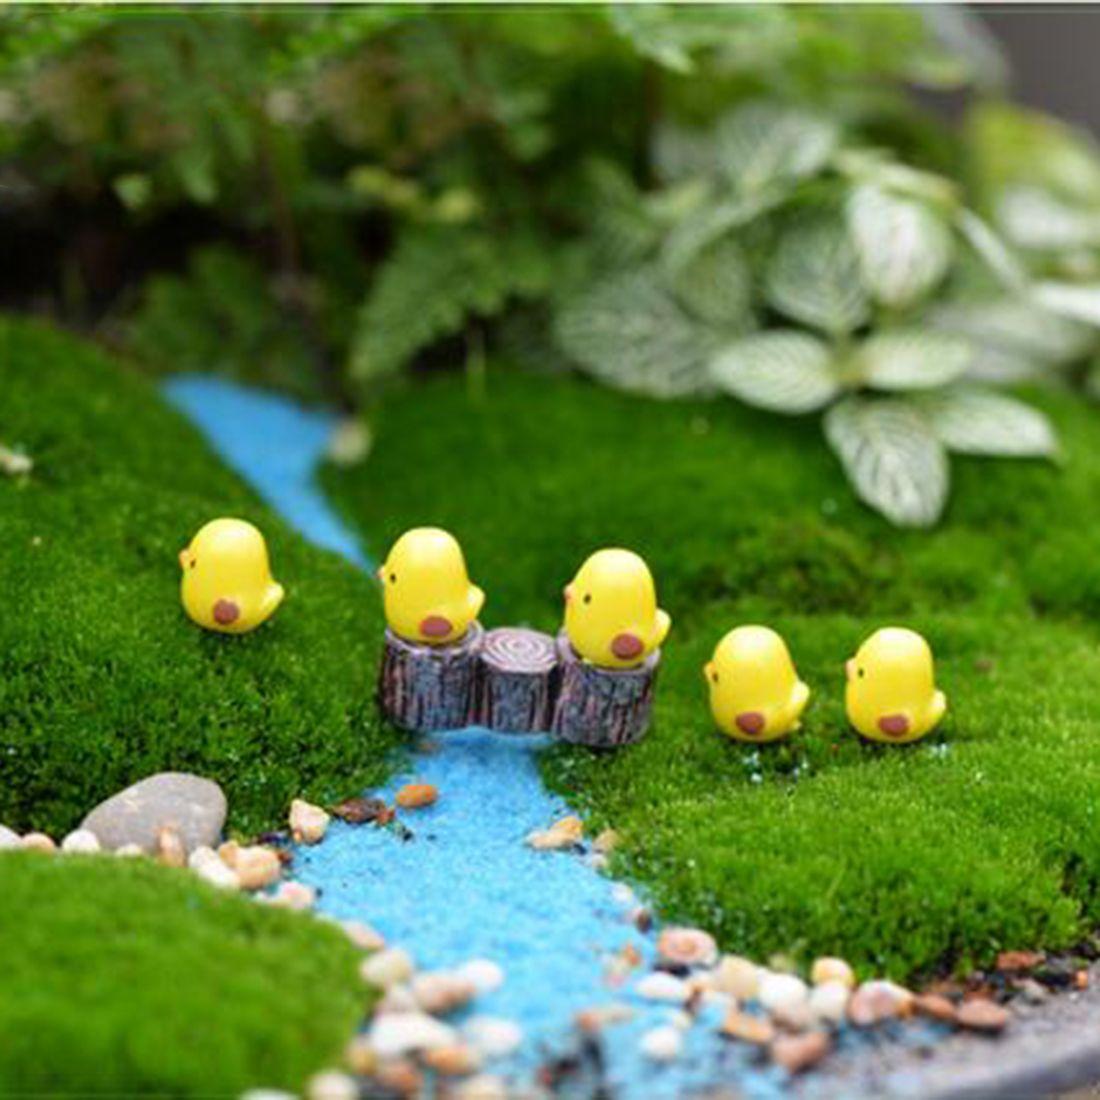 Relaxing Cheap Mini Fairy Garden Buy Quality Miniature Fairies Directlyfrom China Miniature Fairy Figurines Hot Sale Miniature Fairyfigurines On Sale Pinterest Miniature Fairy Figurines garden Cheap Garden Fairies